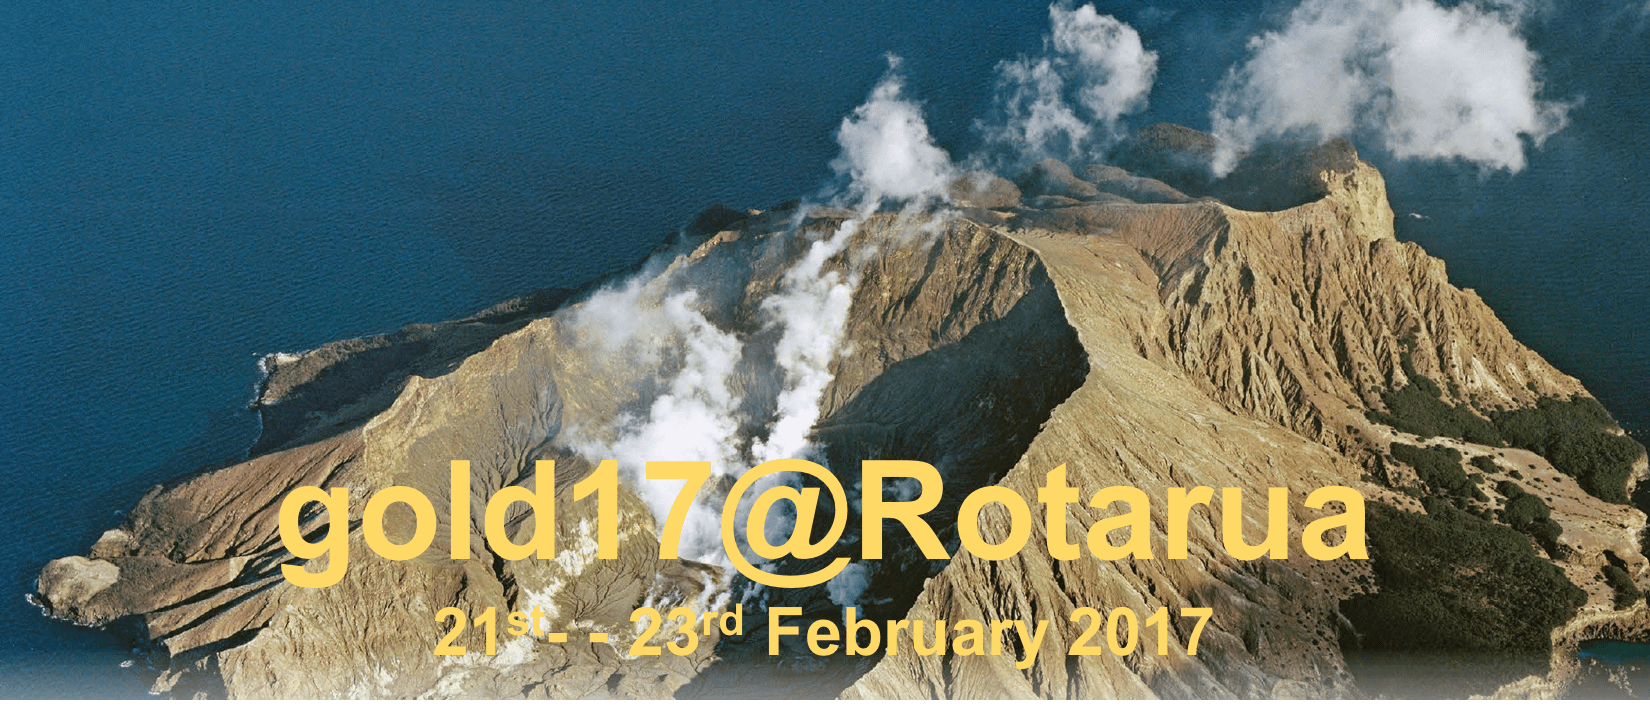 Gold17@Rotorua